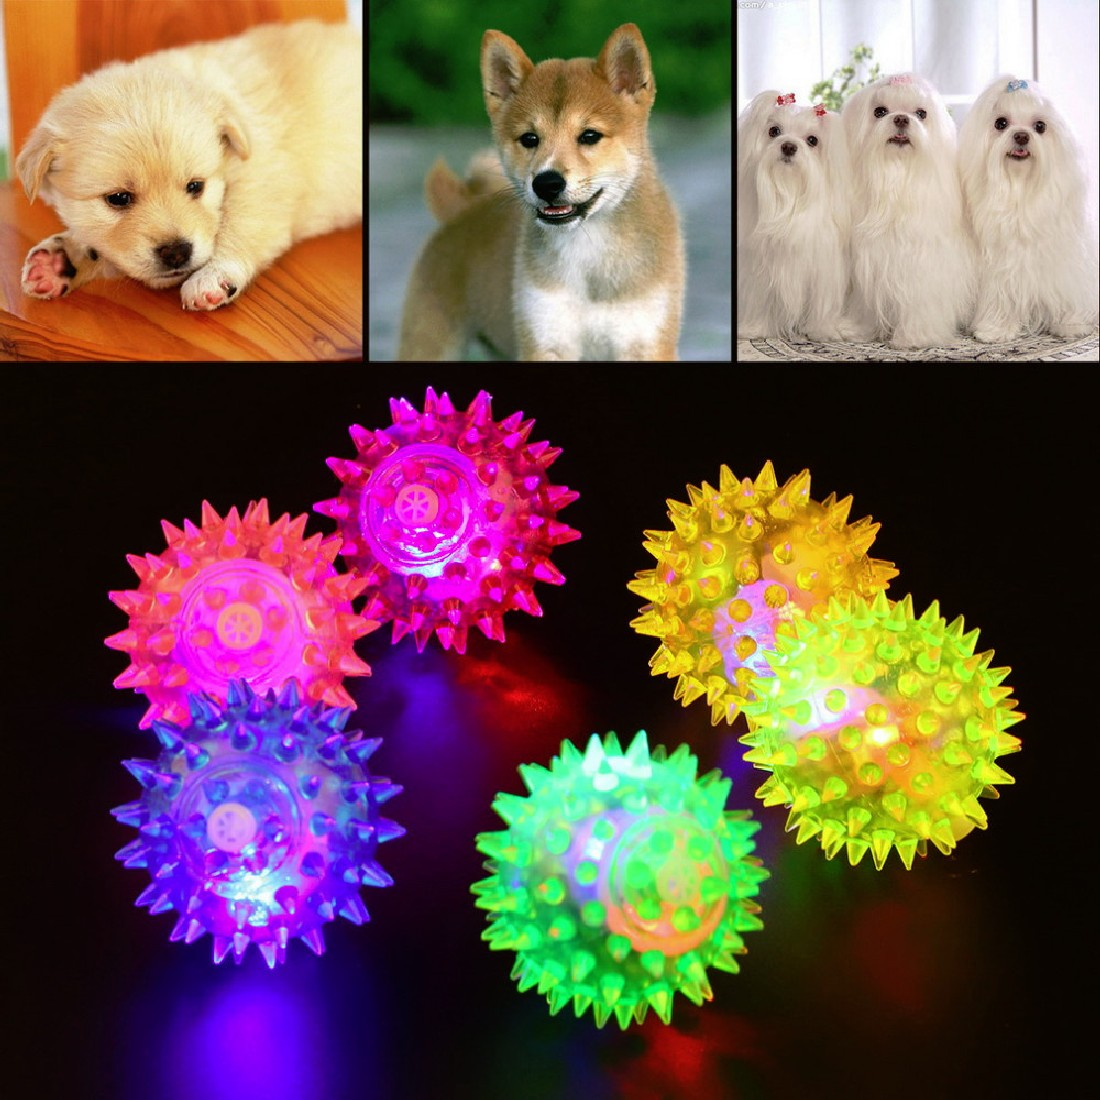 1pcs Dog Puppy Cat Pet LED Squeaky Hedgehog Ball Rubber Bell Sound Ball Fun Night Light Playing Toy Mini Lanterna led USB in LED Night Lights from Lights Lighting